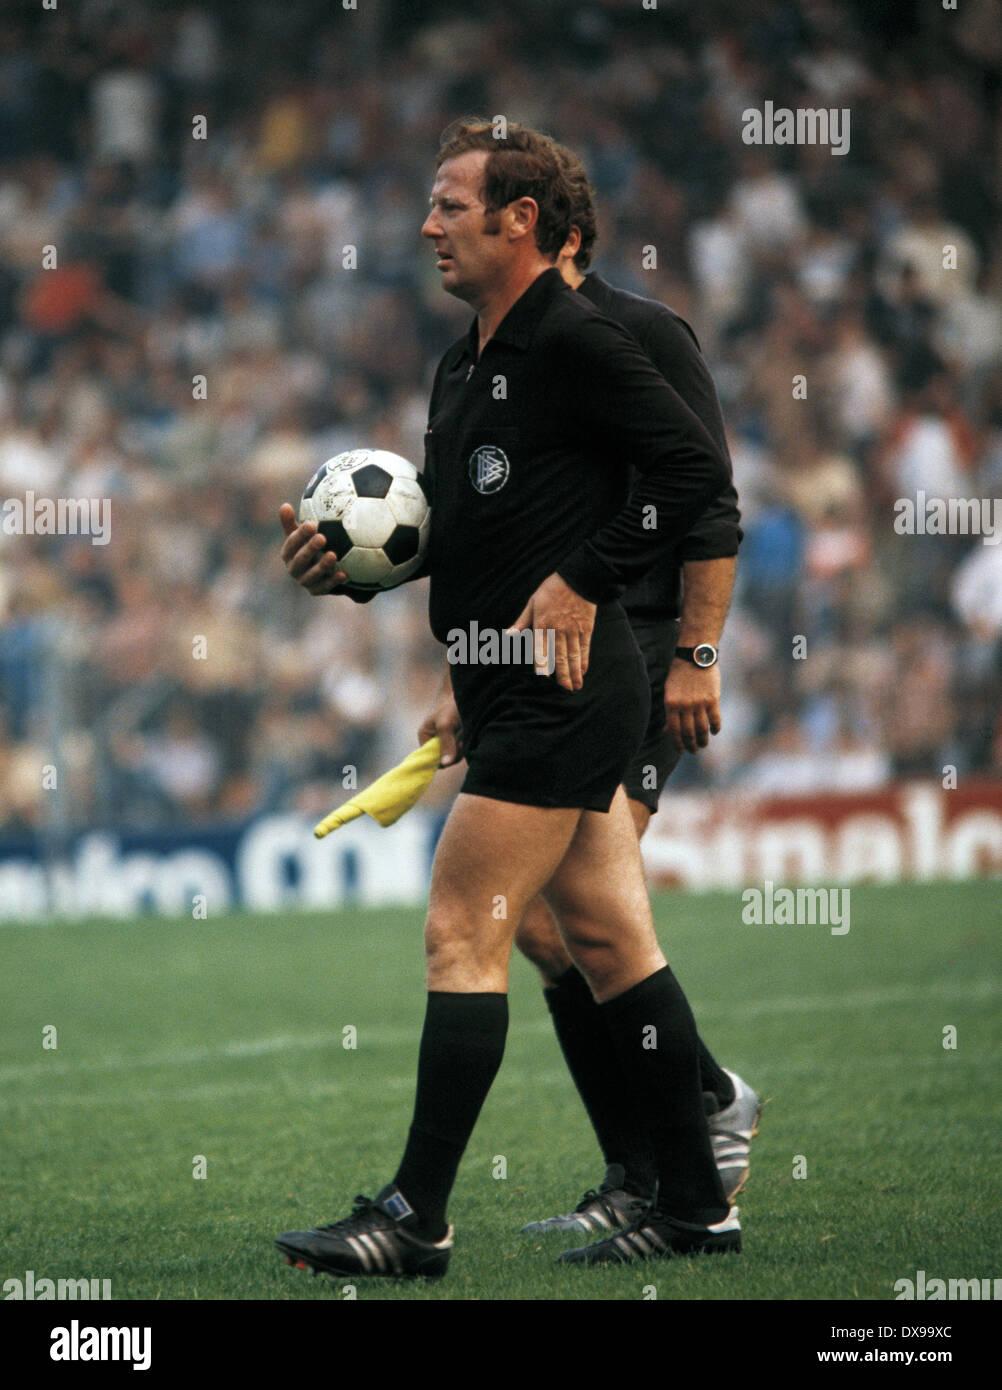 football, Bundesliga, 1979/1980, Ruhr Stadium, VfL Bochum versus FC Bayern Munich 0:1, halftime break, referee Walter Horstmann - Stock Image